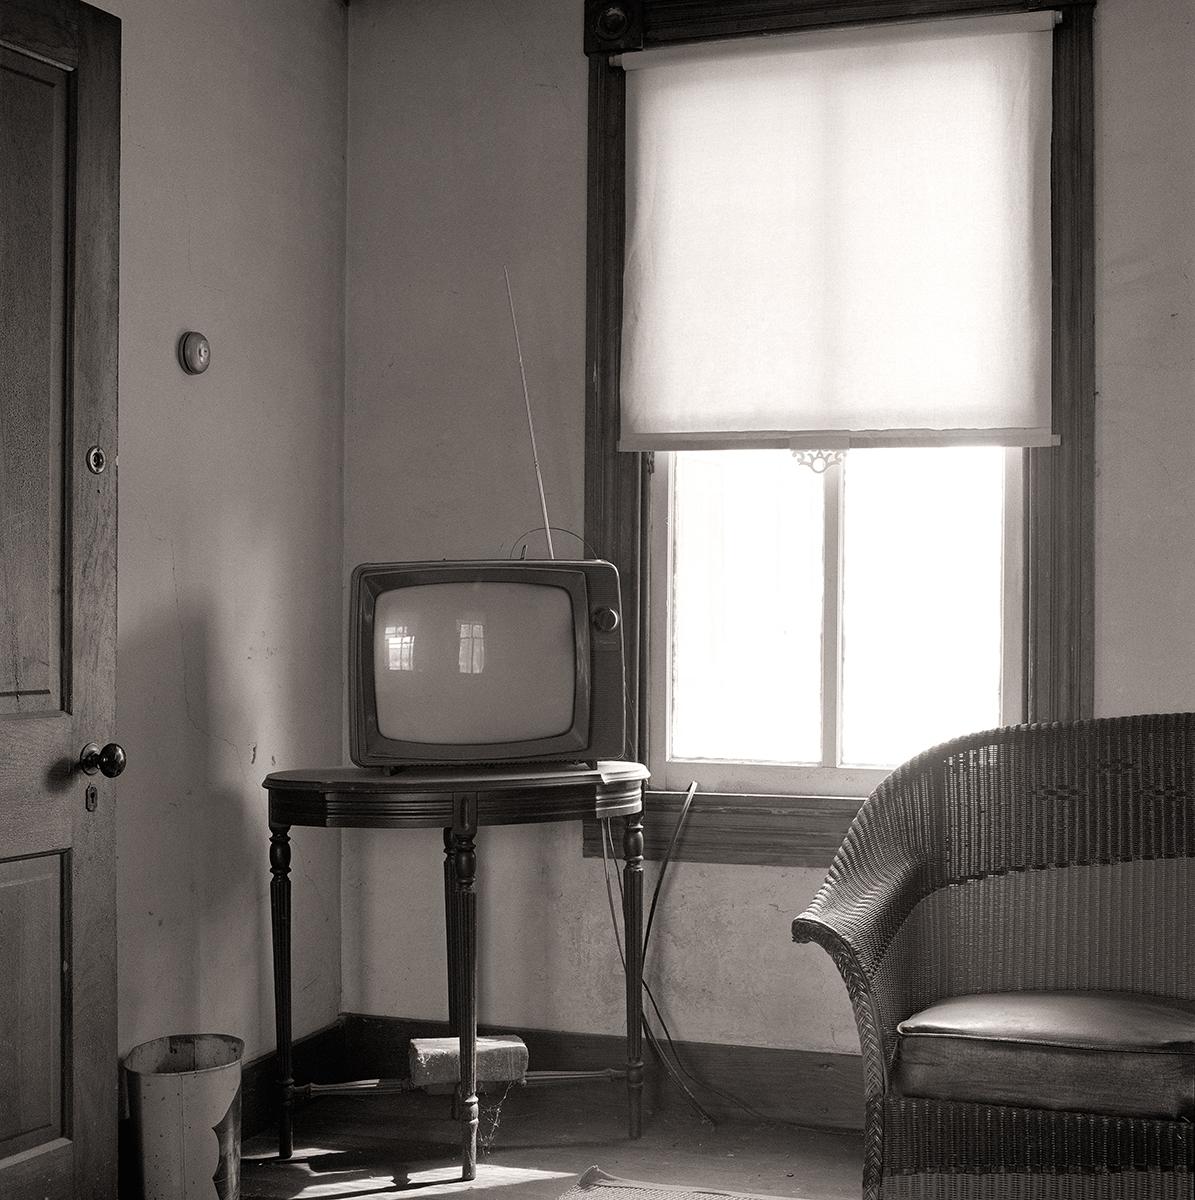 The_TV_Prt1_20in